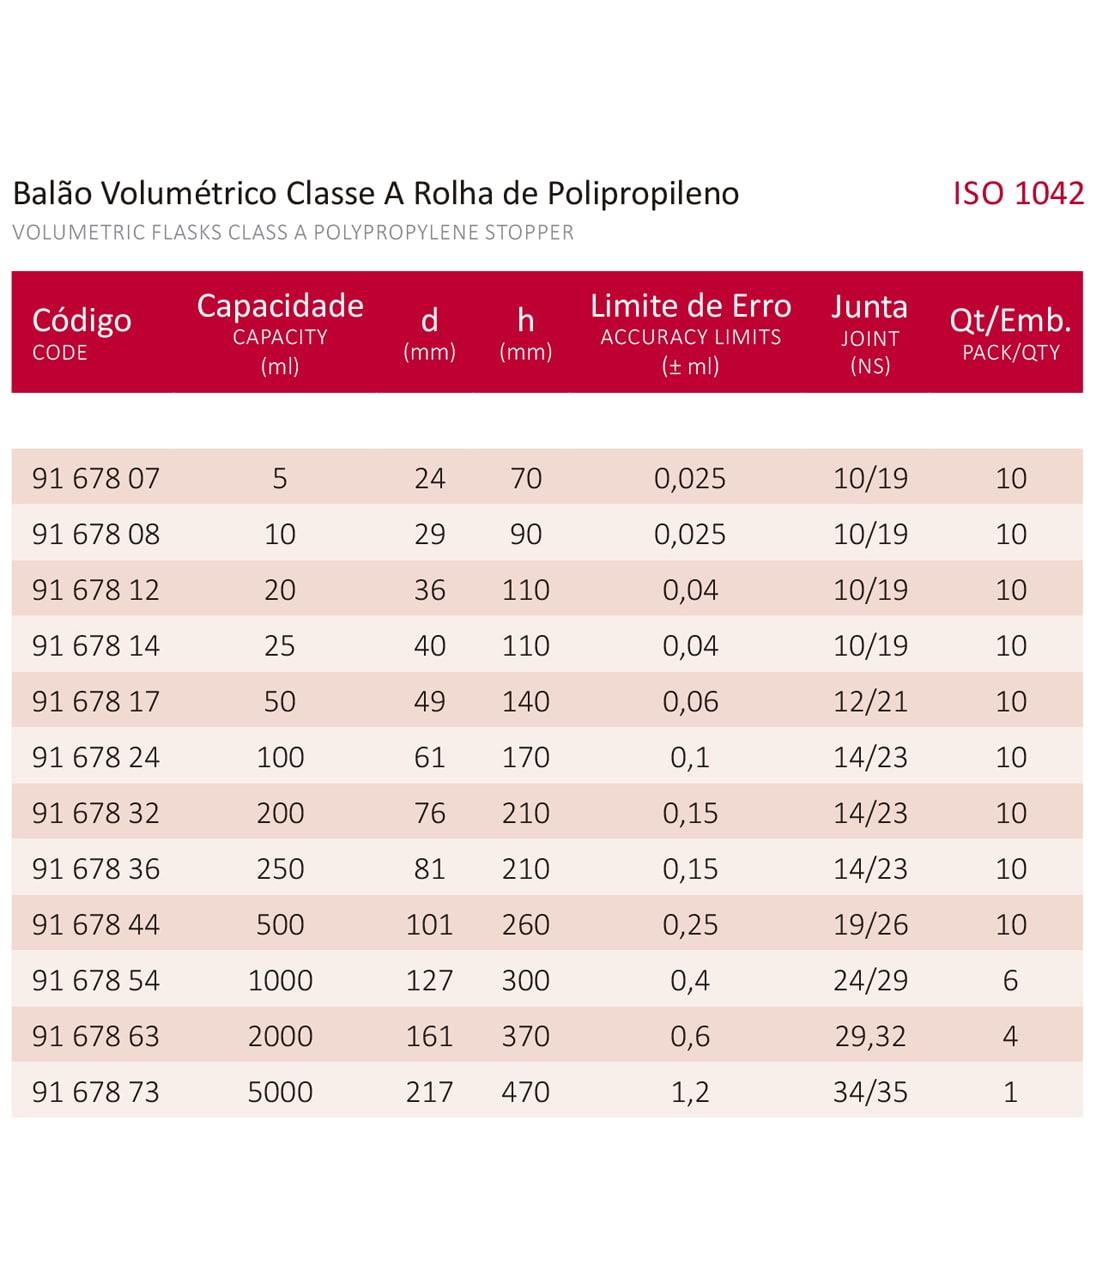 BALÃO VOLUMÉTRICO CLASSE A ROLHA POLI C/ CERTIFICADO RBC 1000 ML - Marca Laborglas - Cód. 9167854-R